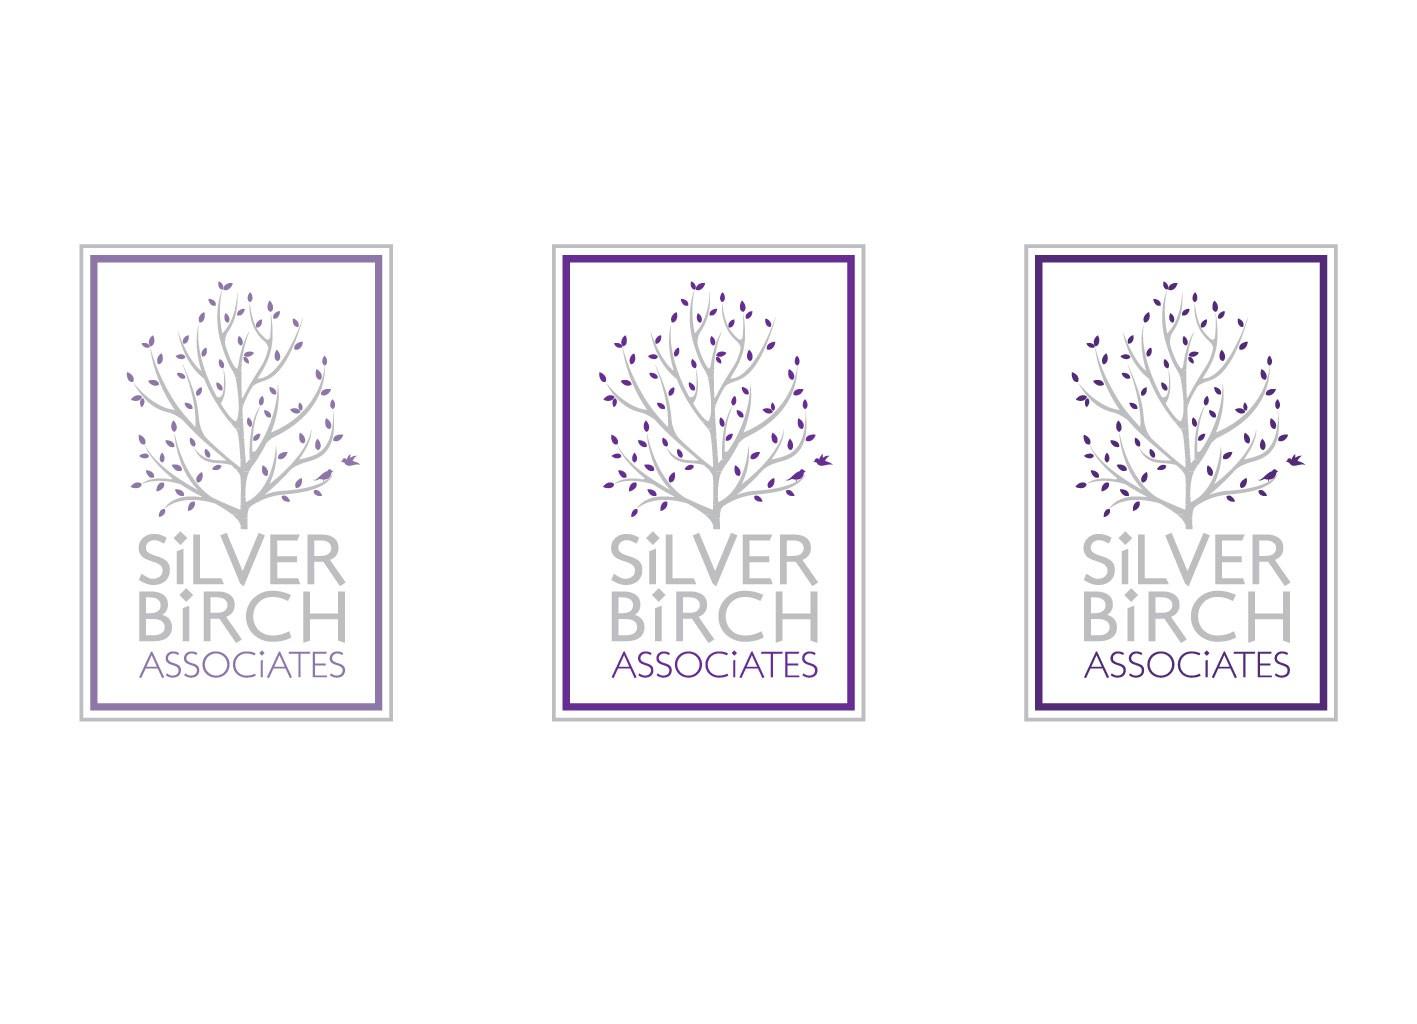 Help Silver Birch Associates with a new logo